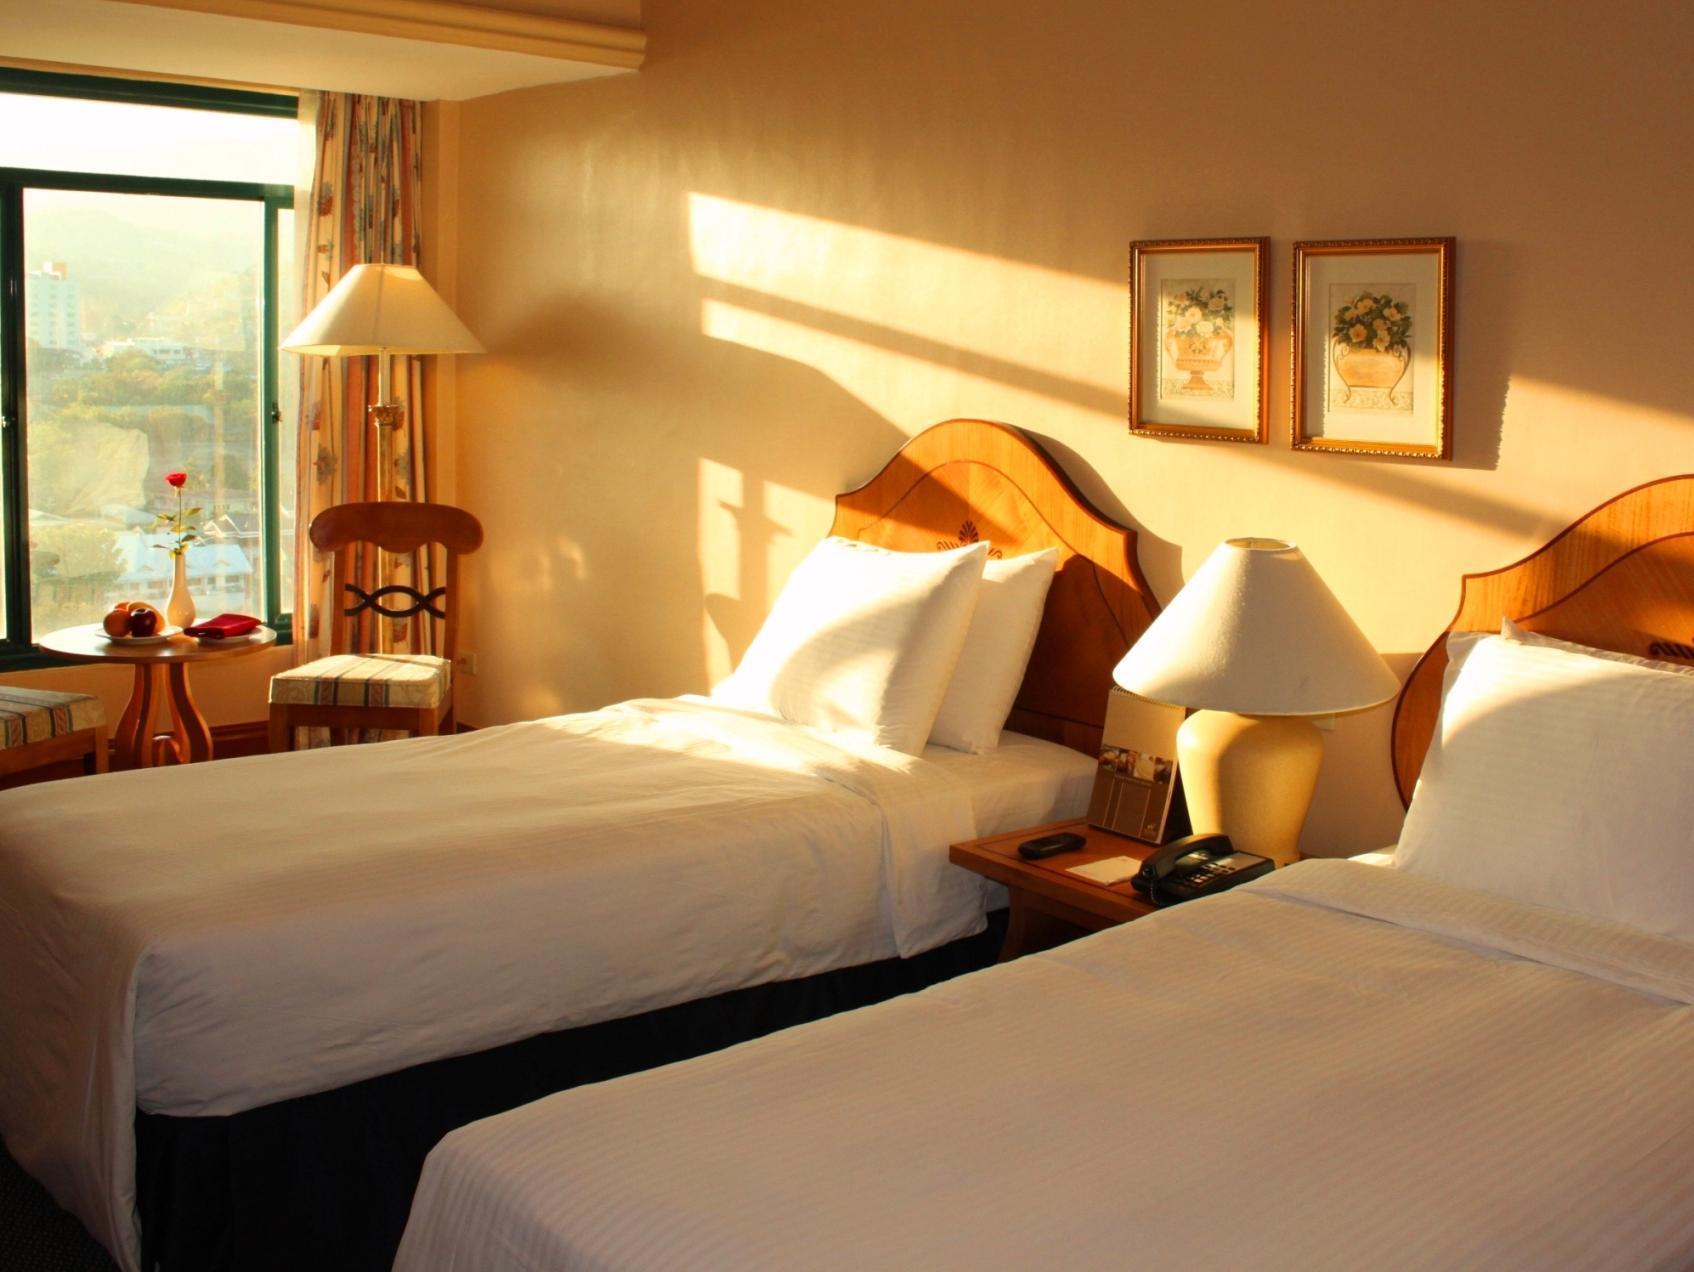 Waterfront Hotel And Casino Cebu Room Rates